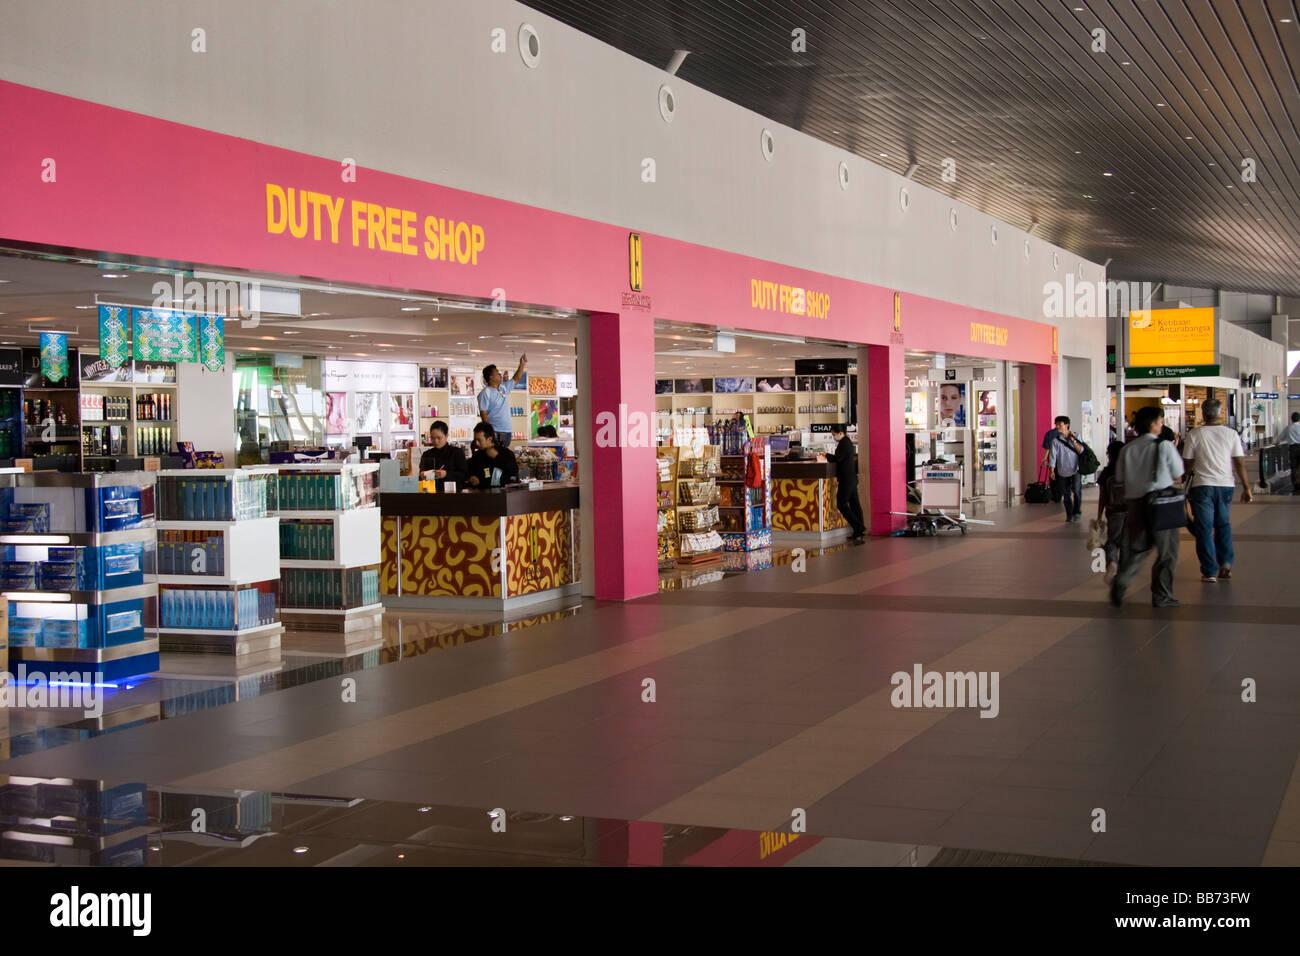 Duty Free shop Kota Kinabalu Airport interior - Stock Image